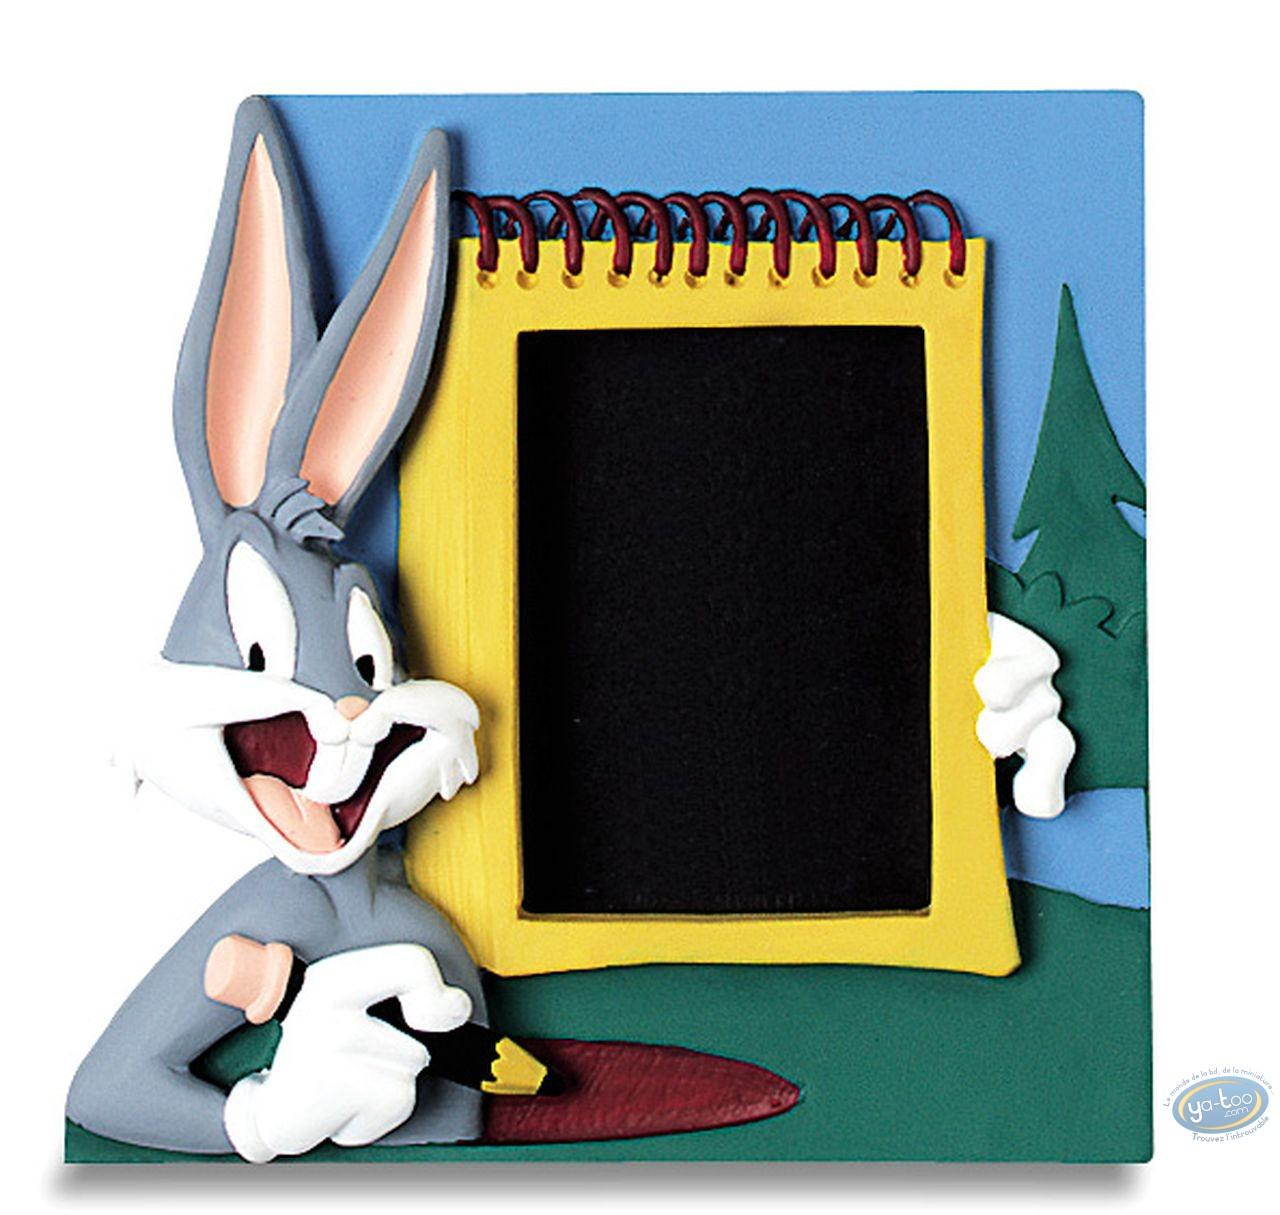 vente en ligne cadre photo bugs bunny bugs bunny petit format. Black Bedroom Furniture Sets. Home Design Ideas